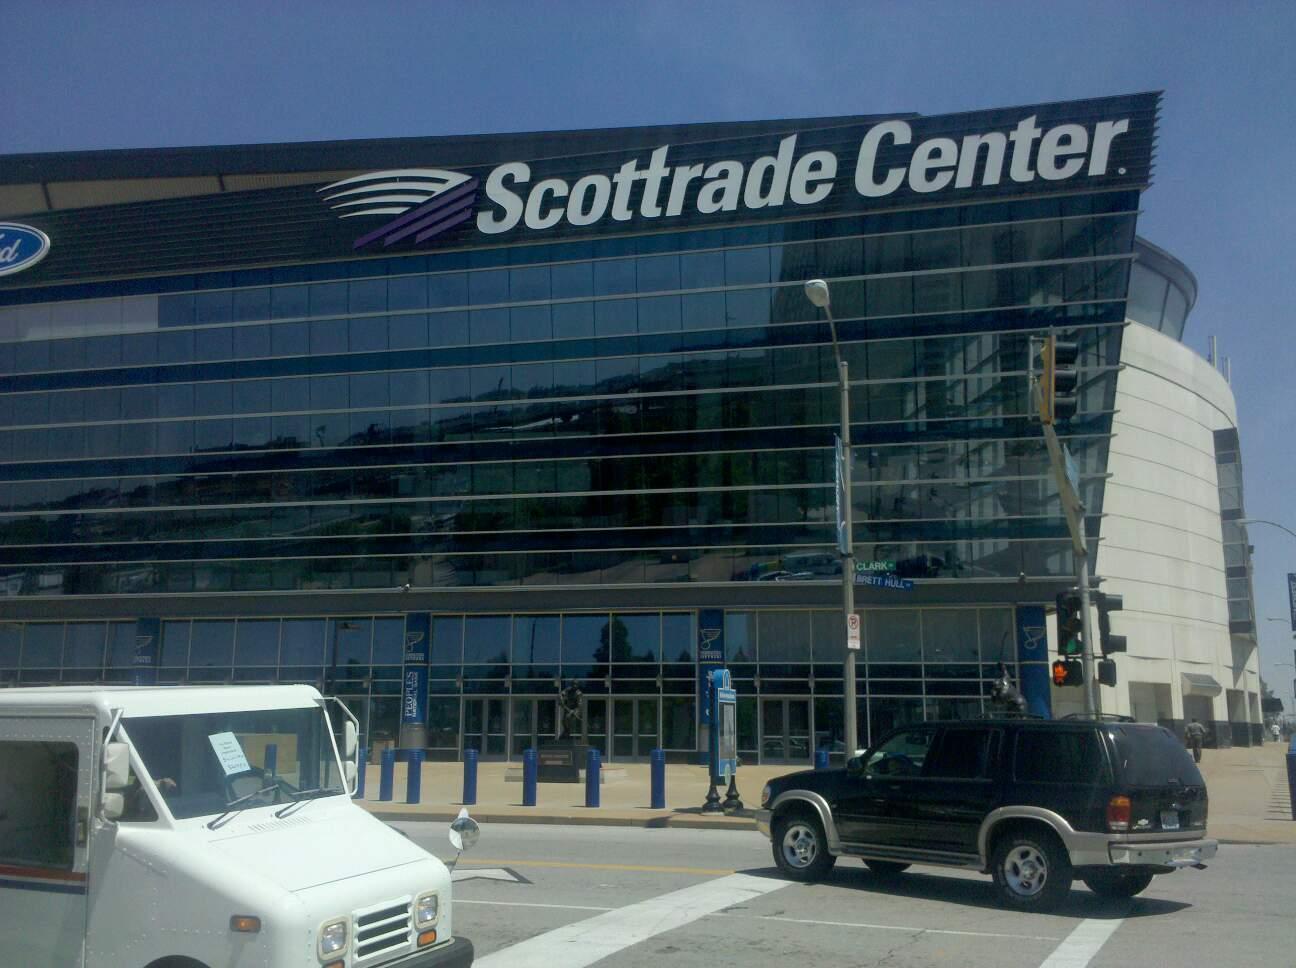 Enterprise Center Section Clark Ave Entrance